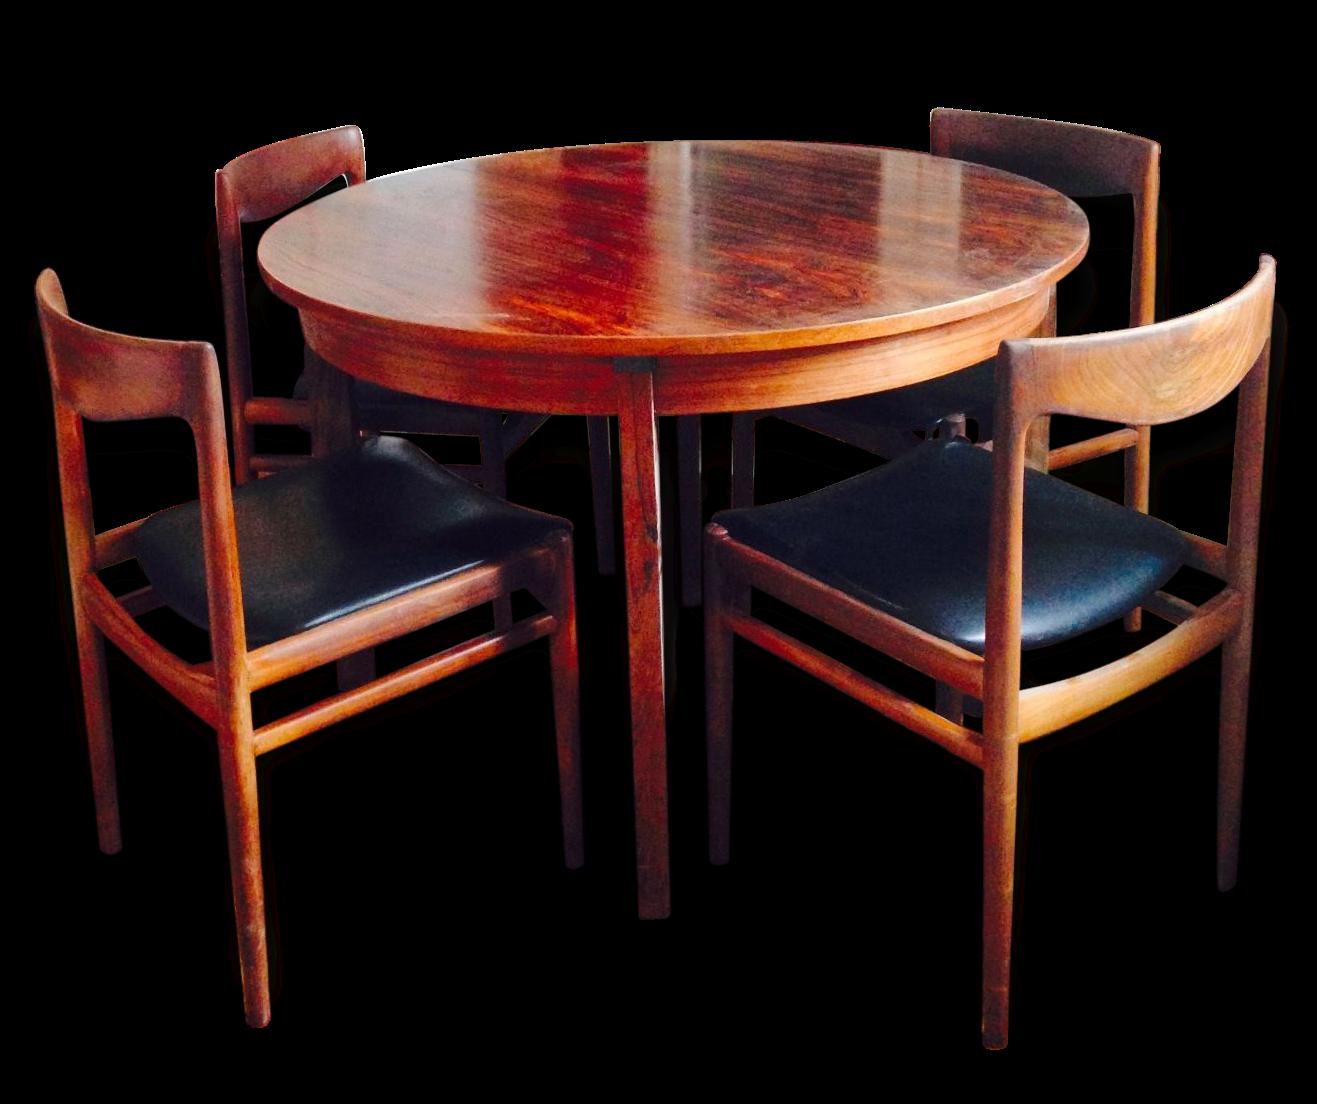 roche bobois chaise table plus chaises salle manger. Black Bedroom Furniture Sets. Home Design Ideas